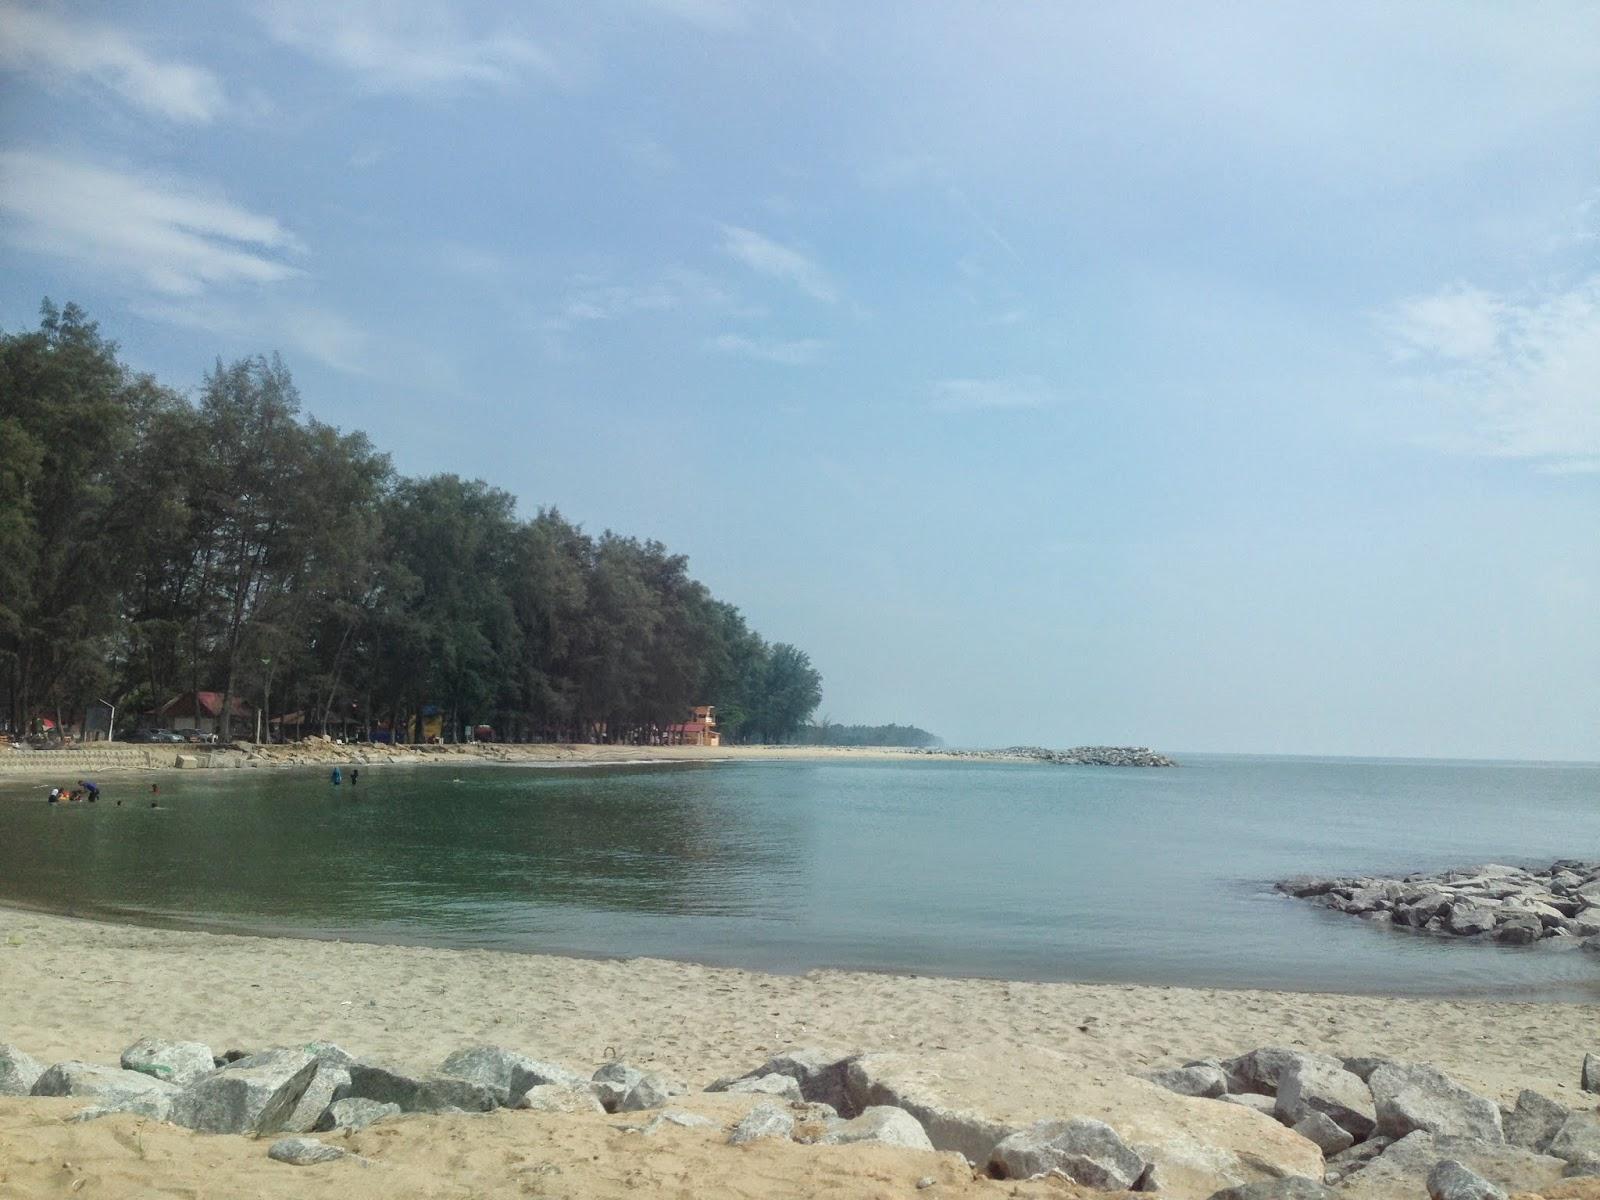 Pantai Irama scenery